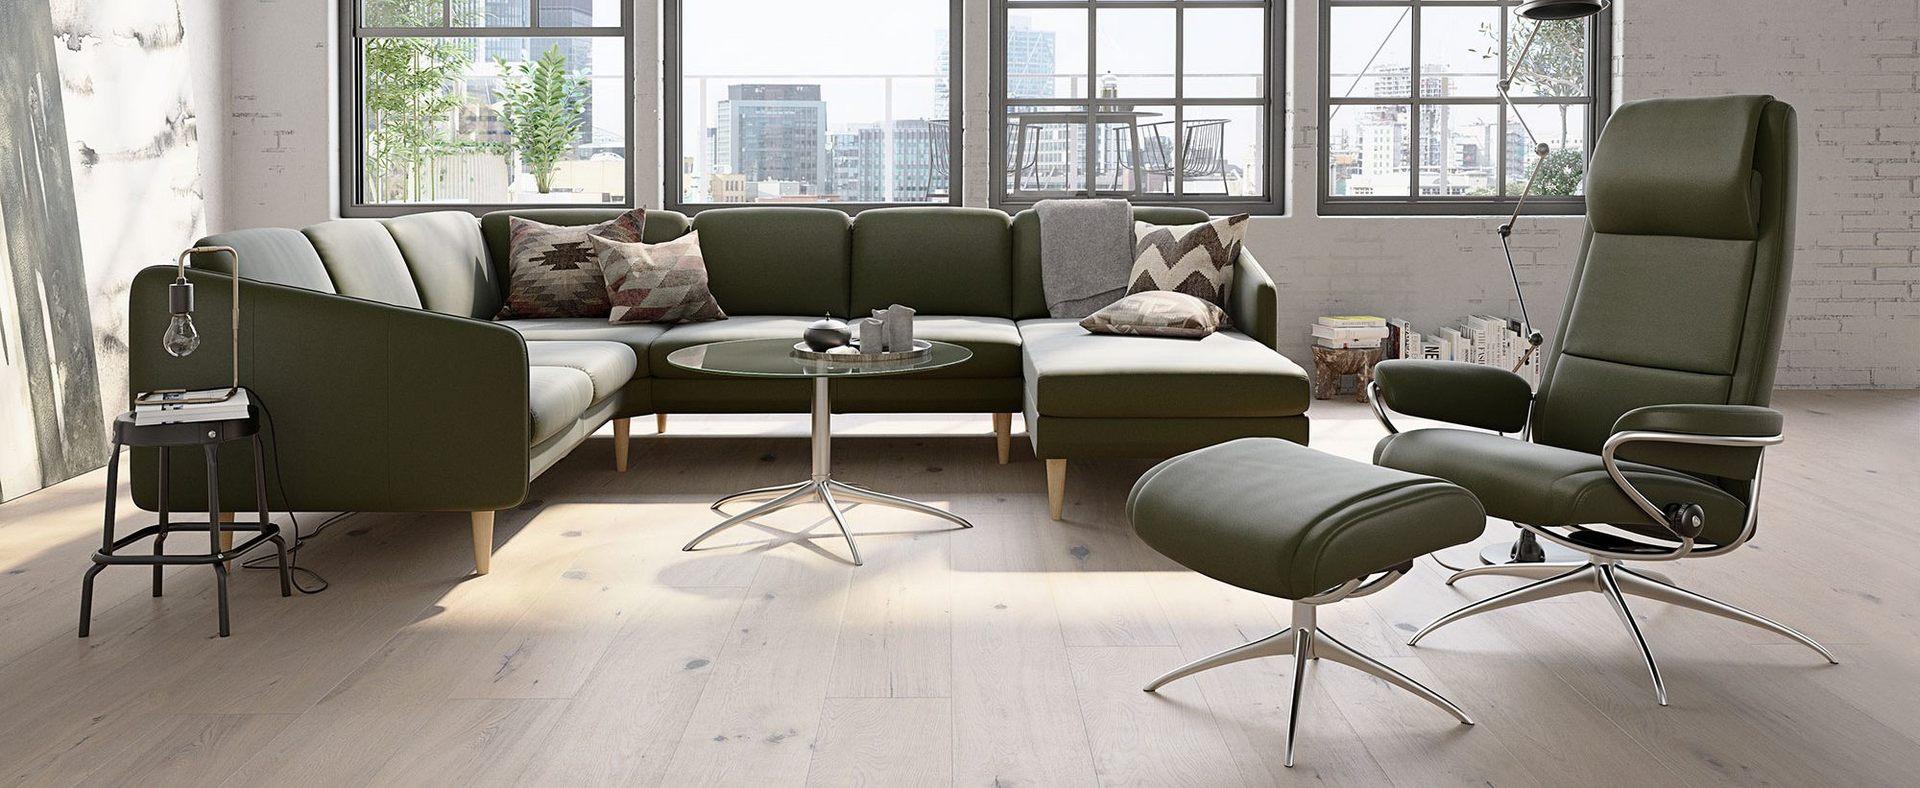 Full Size of Stressless Sofa Furniture Usa Leather Couch Uk Cost Canada Markenwelten Sommerlad Weiß Grau Innovation Berlin Ausziehbar Barock Relaxfunktion Xxxl Mit Megapol Sofa Stressless Sofa